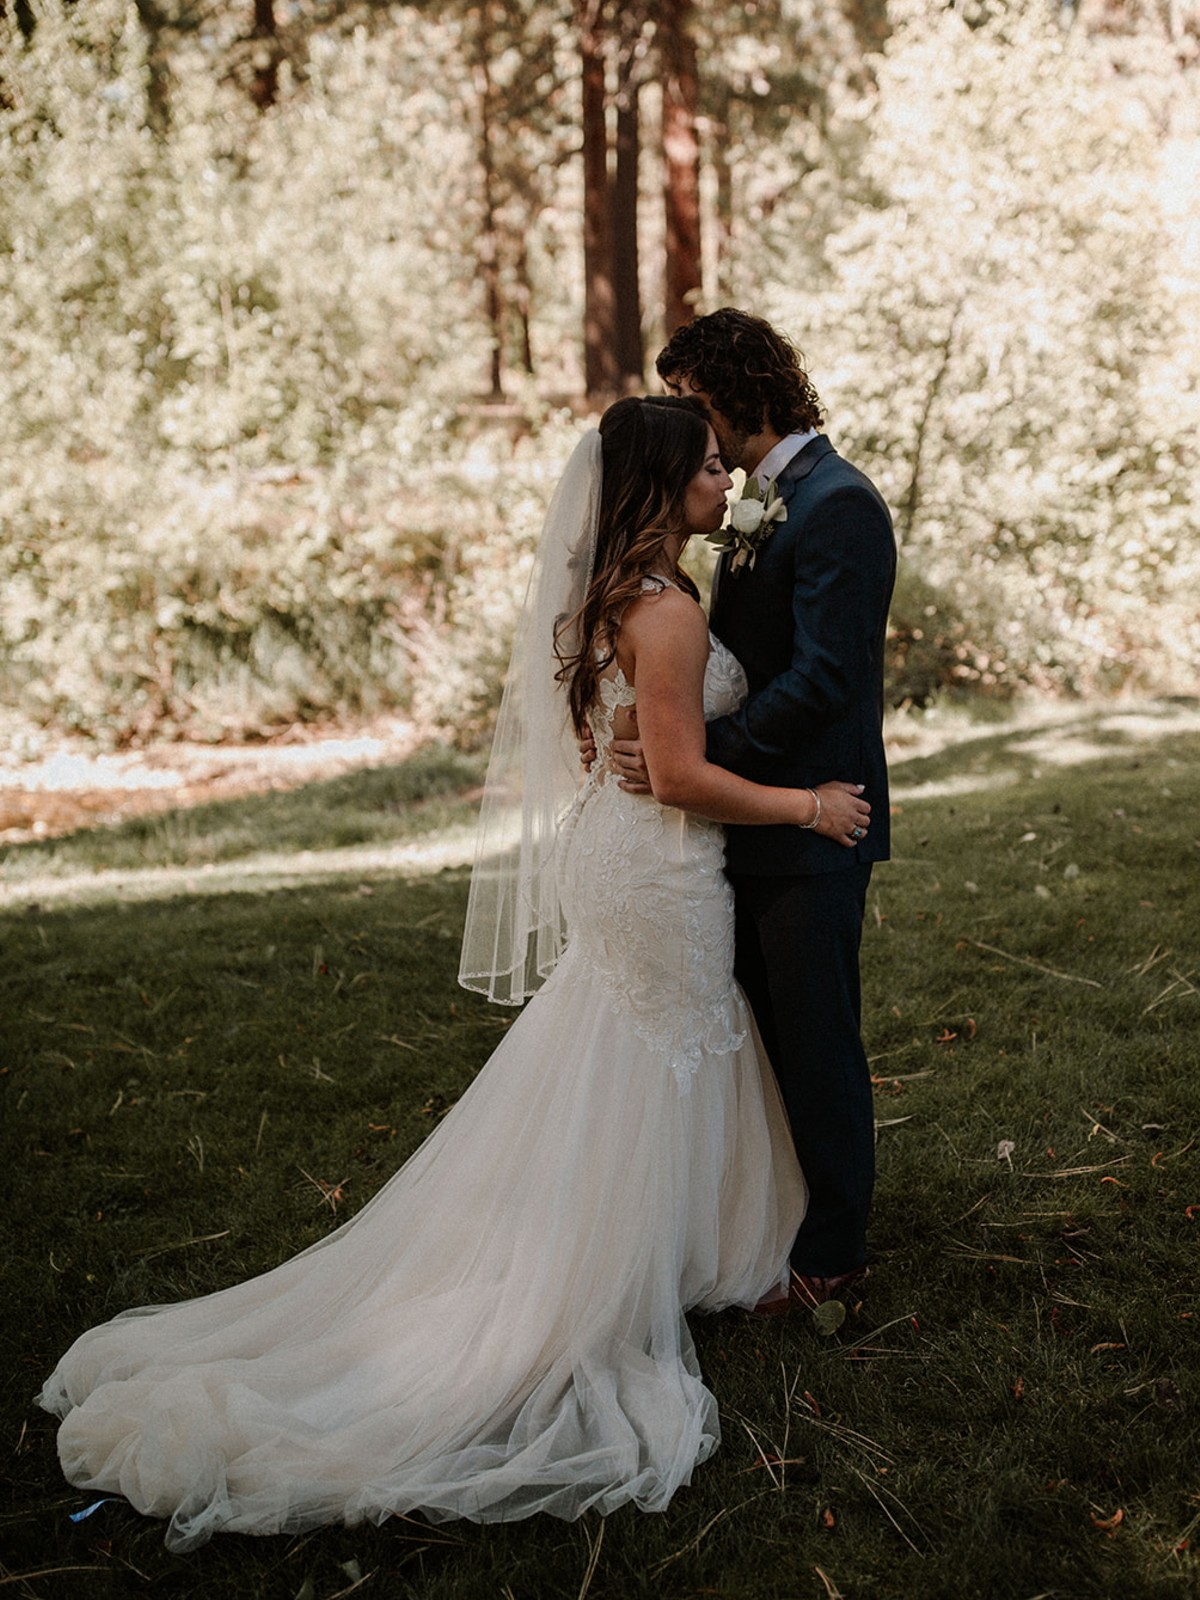 Nancy Rice Artistry - Lake Tahoe wedding hair & makeup - couple embracing